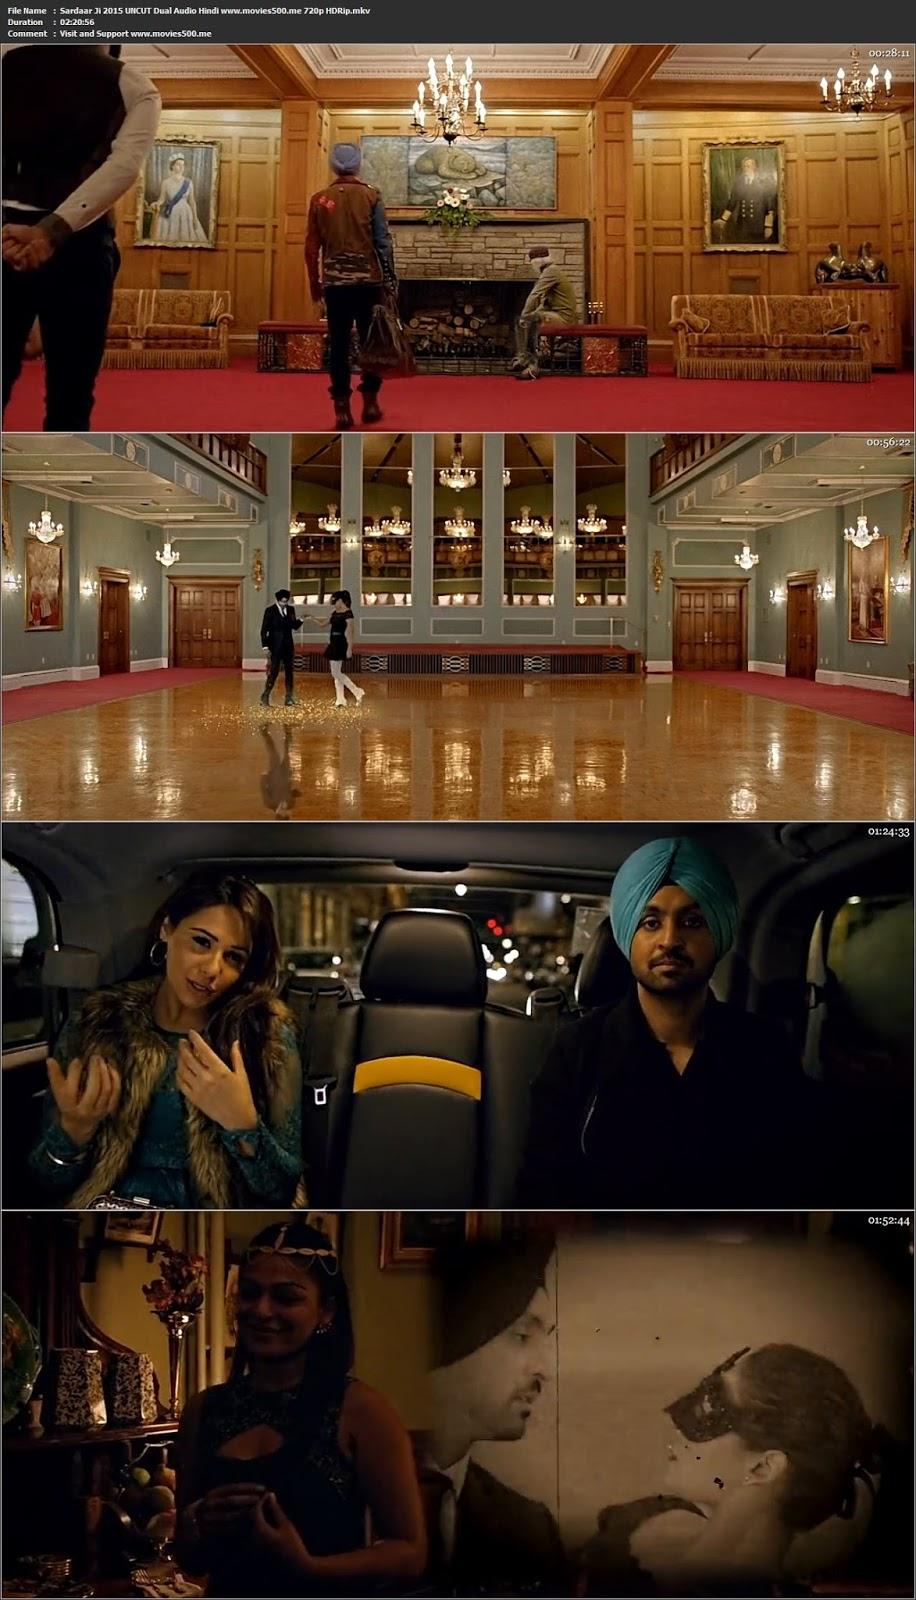 Sardaar Ji 2015 UNCUT Punjabi Movie HDRip 720p 1.4GB at xn--o9jyb9aa09c103qnhe3m5i.com